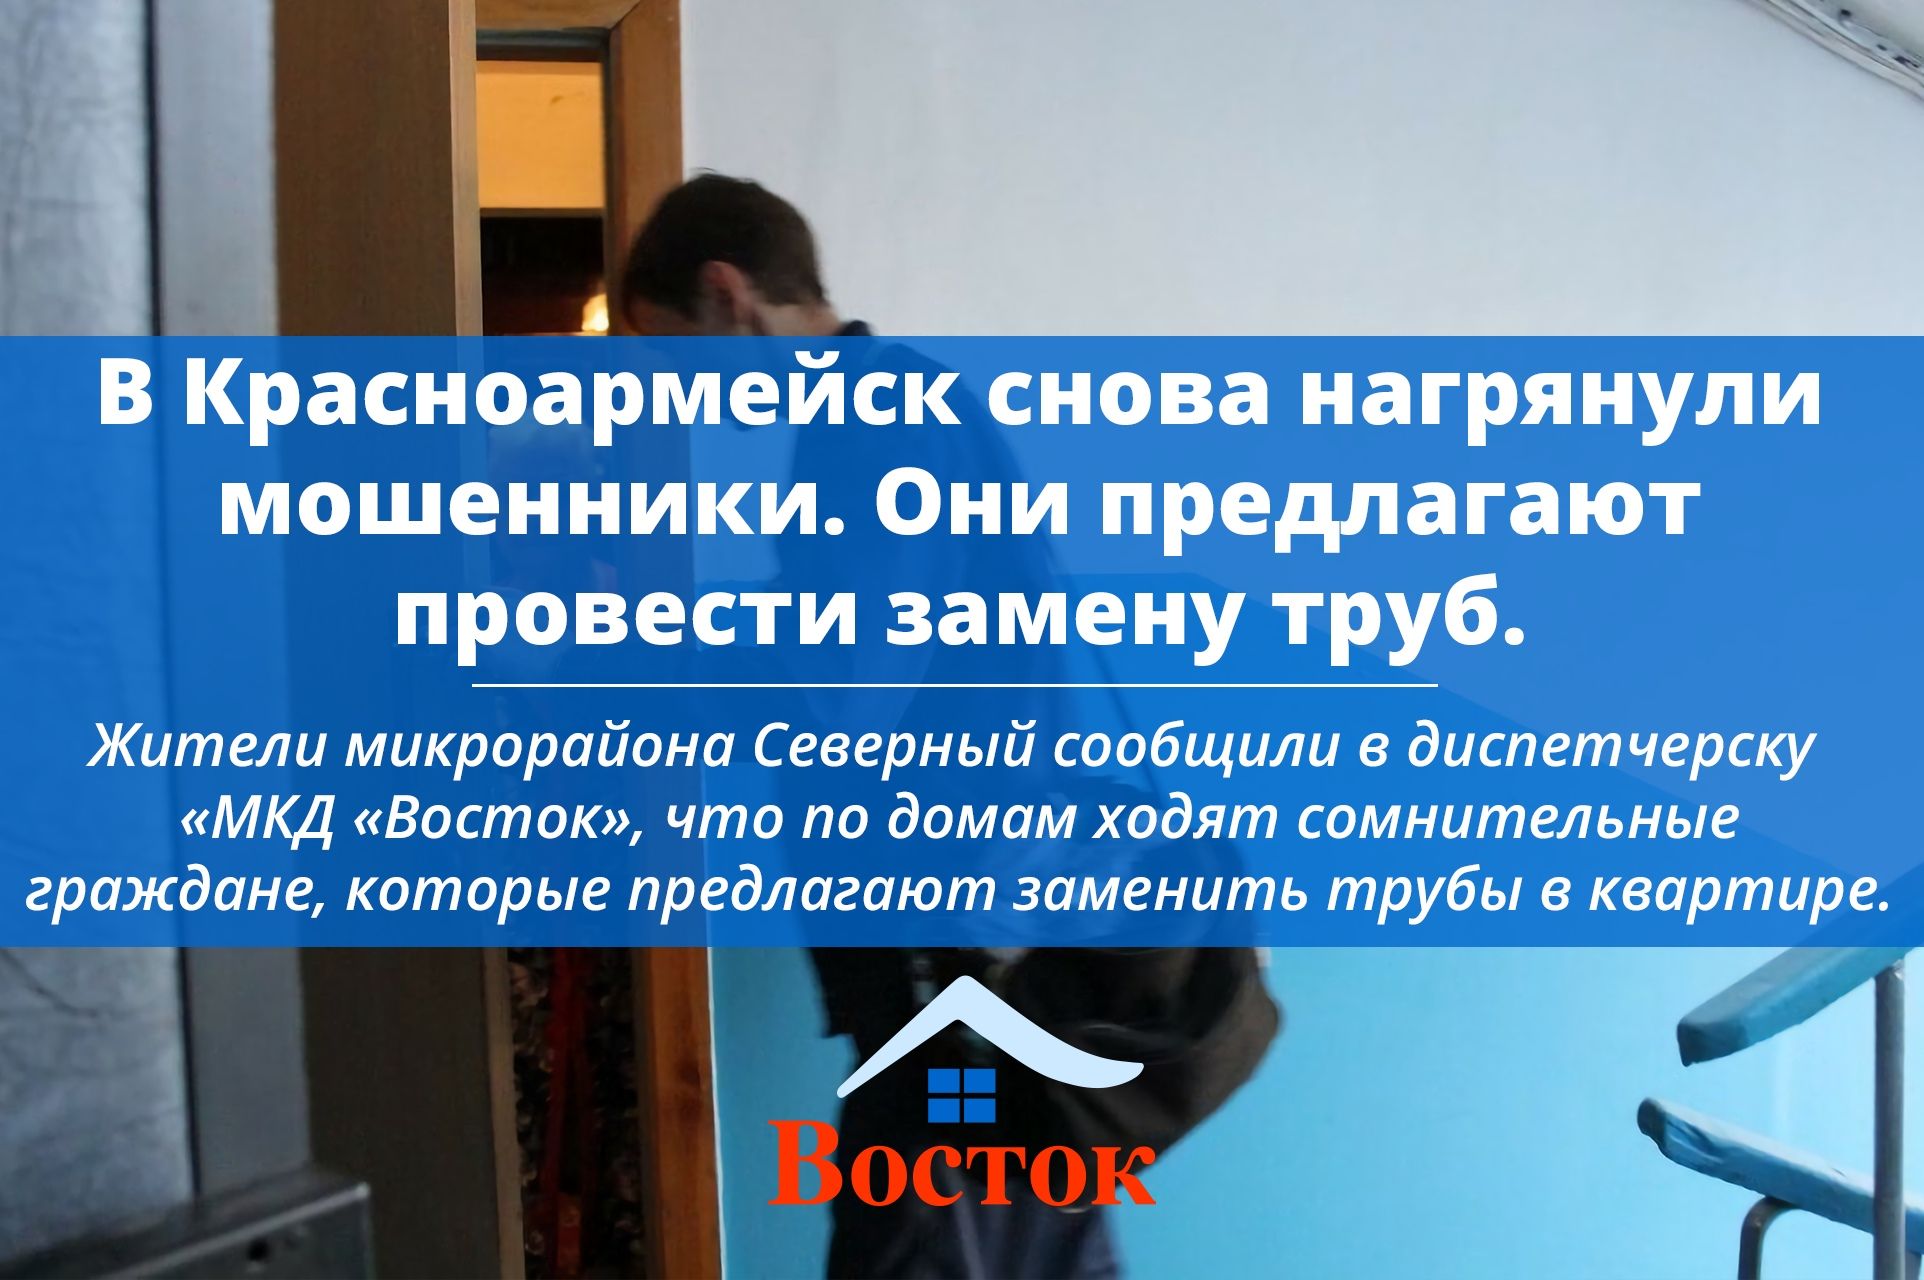 В Красноармейске снова мошенники: предлагают замену труб